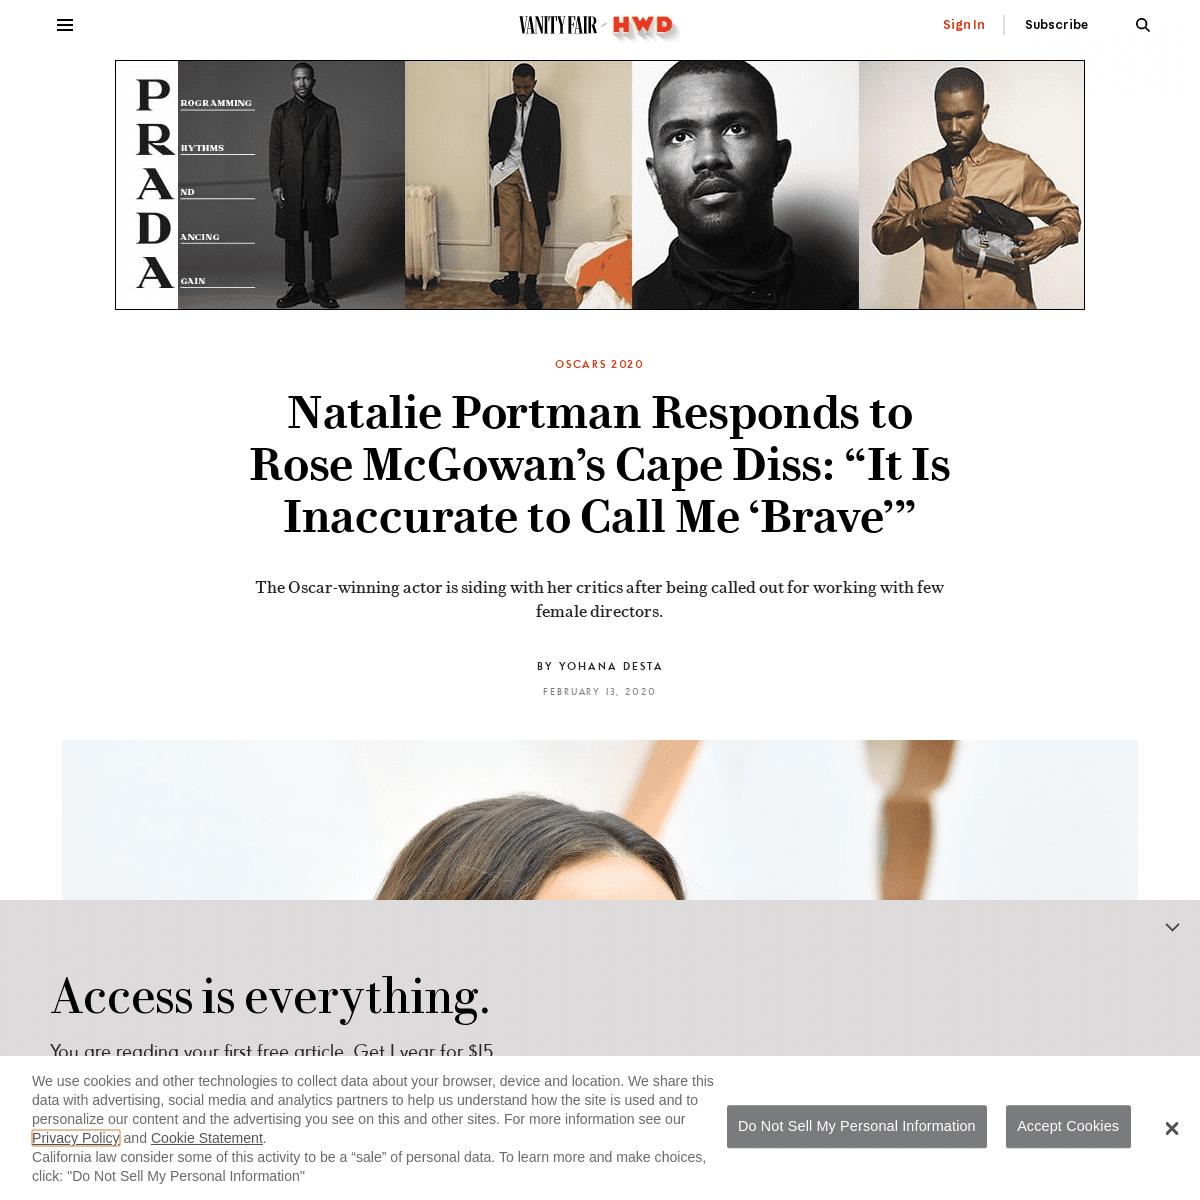 "ArchiveBay.com - www.vanityfair.com/hollywood/2020/02/natalie-portman-rose-mcgowan-oscars-cape - Natalie Portman Responds to Rose McGowan's Cape Diss- ""It Is Inaccurate to Call Me 'Brave'"" - Vanity Fair"